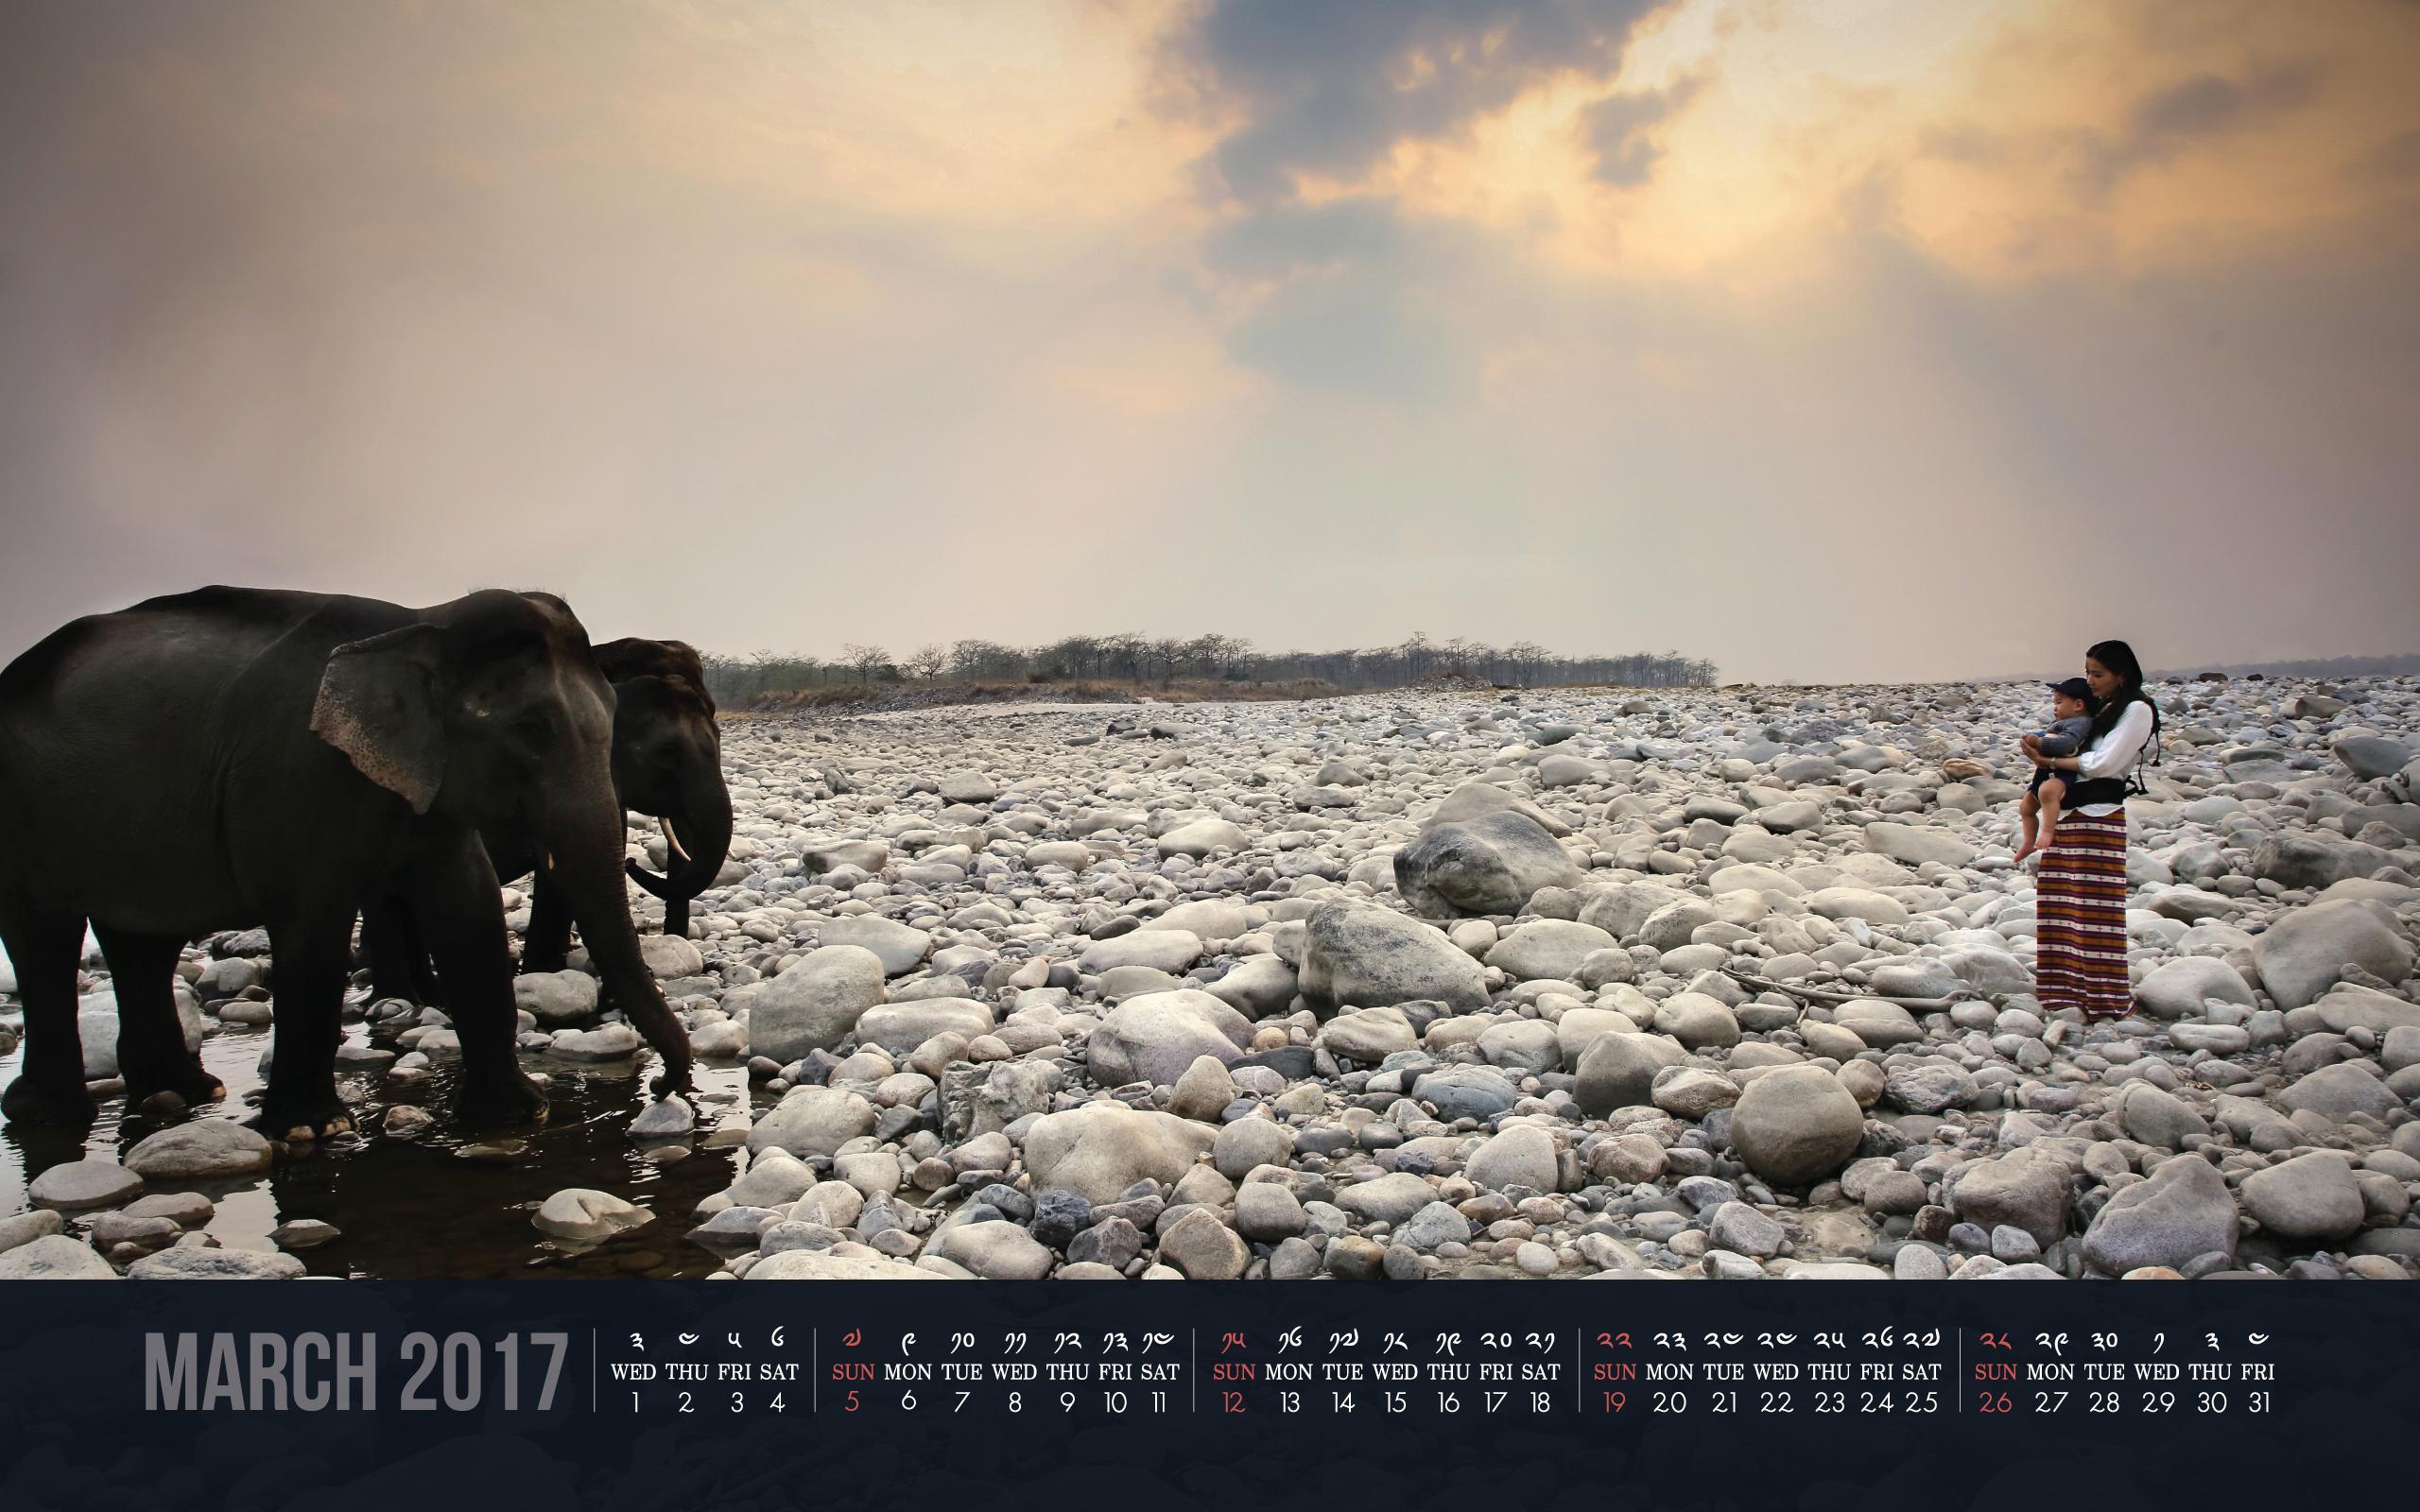 Desktop Calendars For March 2017